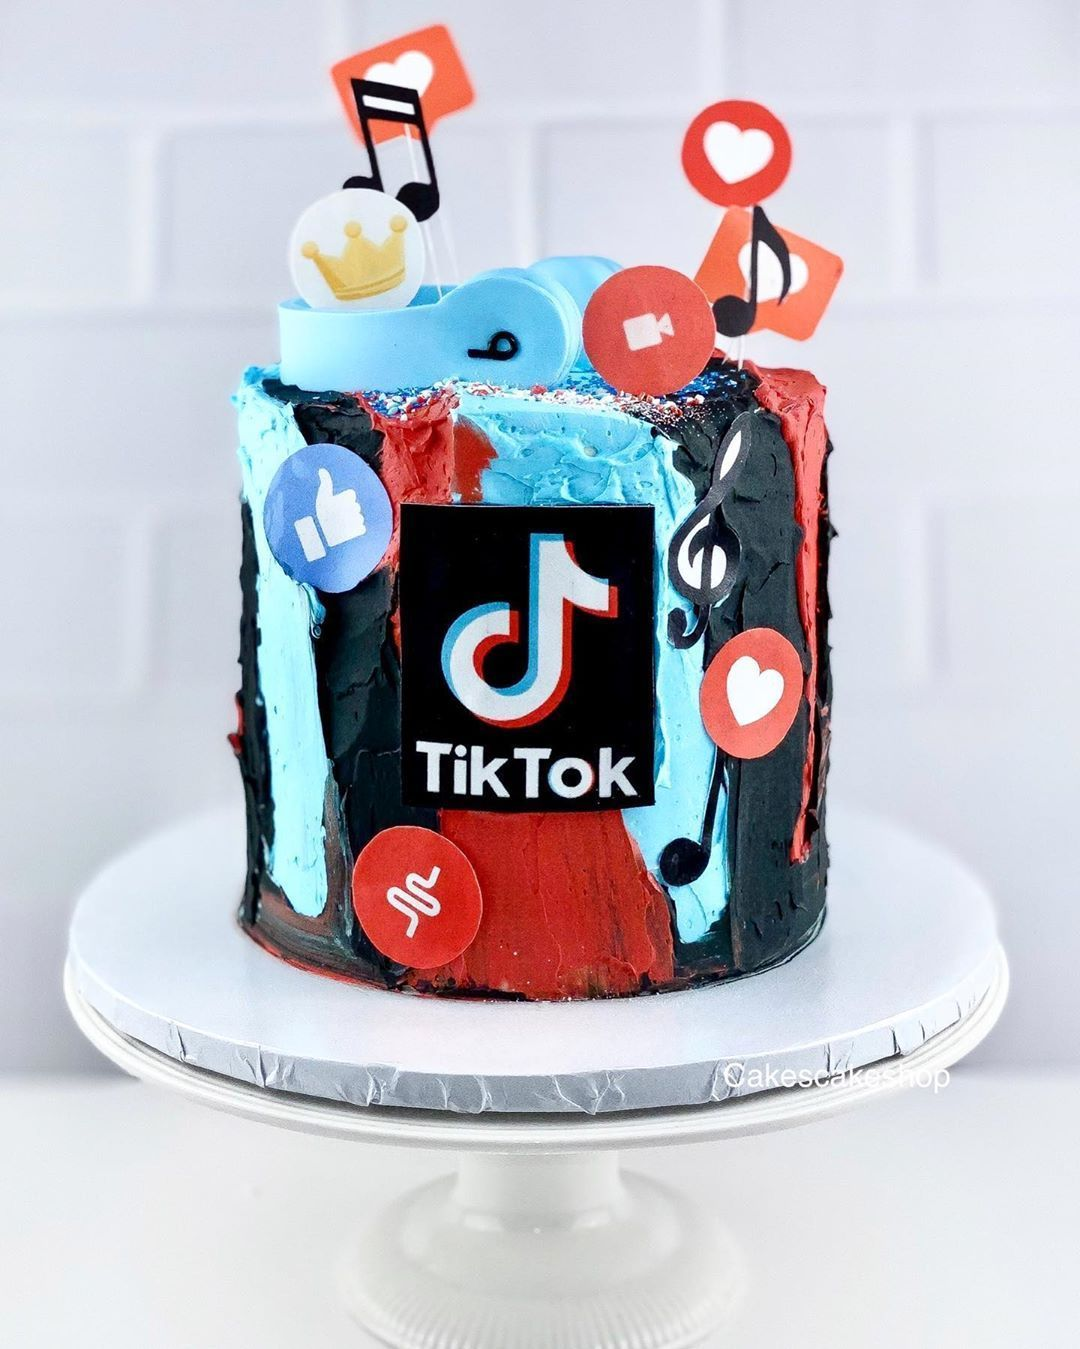 Pastel Tik Tok Cool Birthday Cakes Baby First Birthday Cake Unicorn Birthday Cake